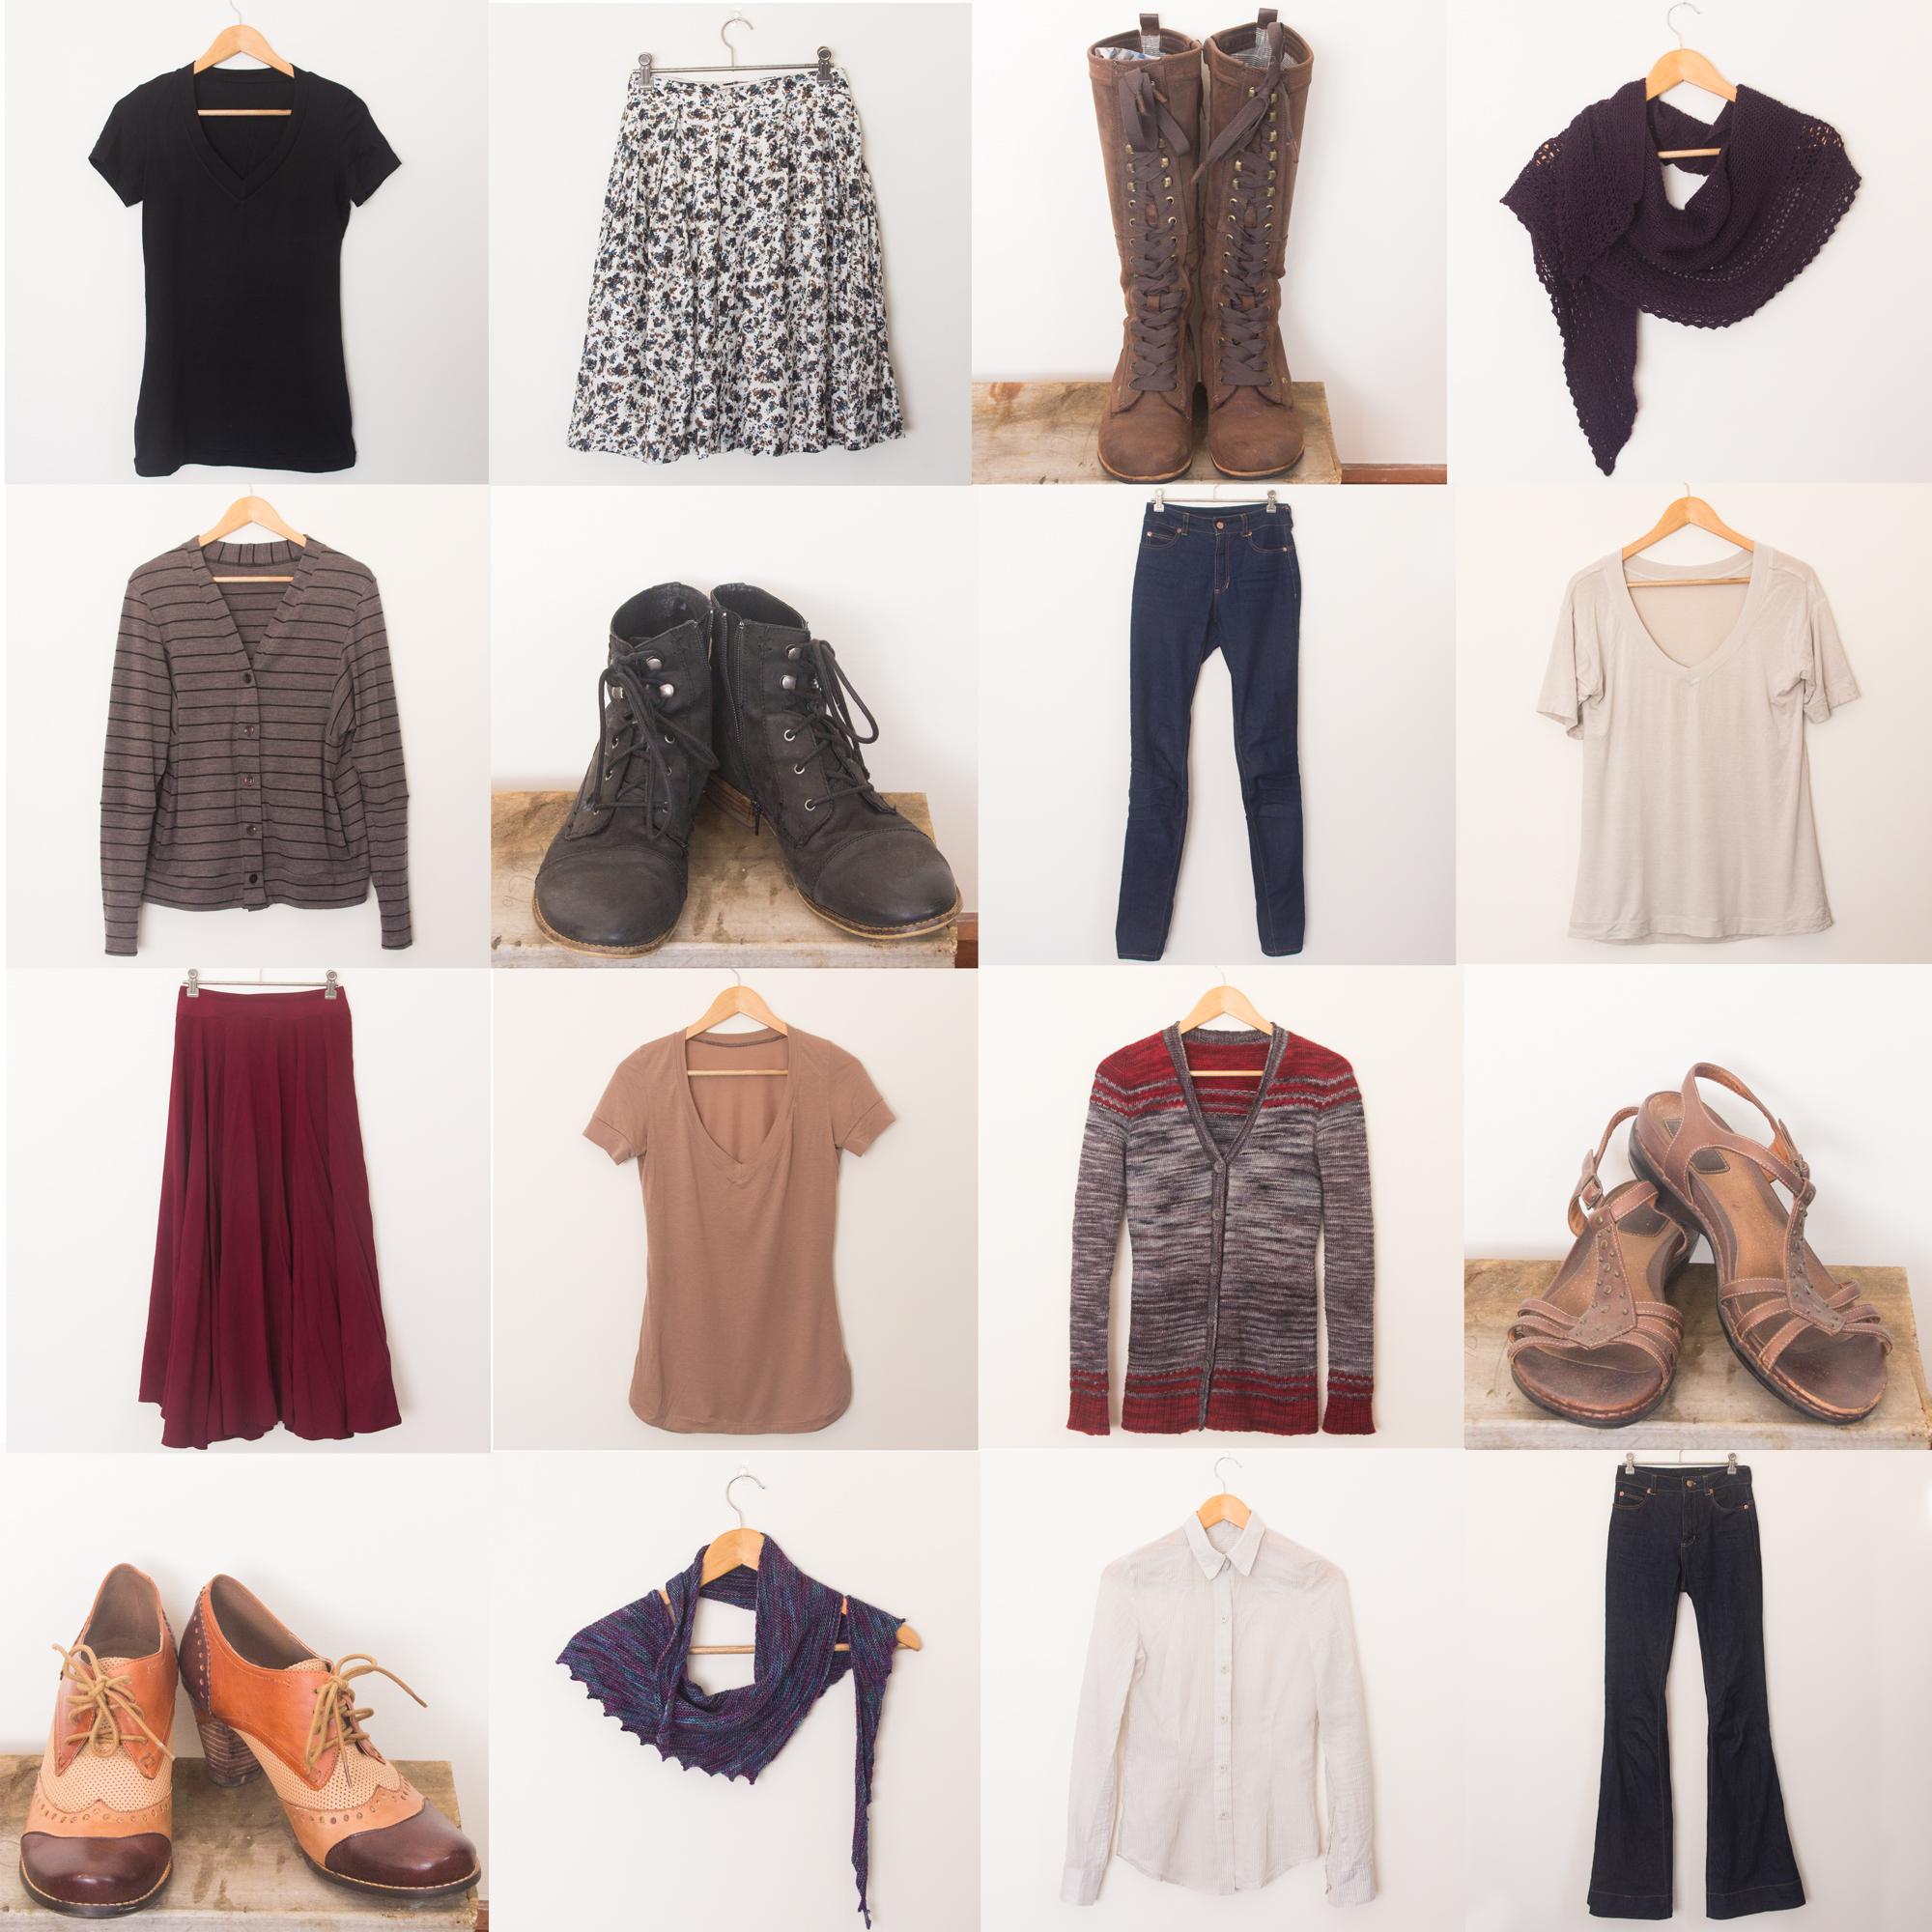 wardrobe-sudoku-blog.jpg